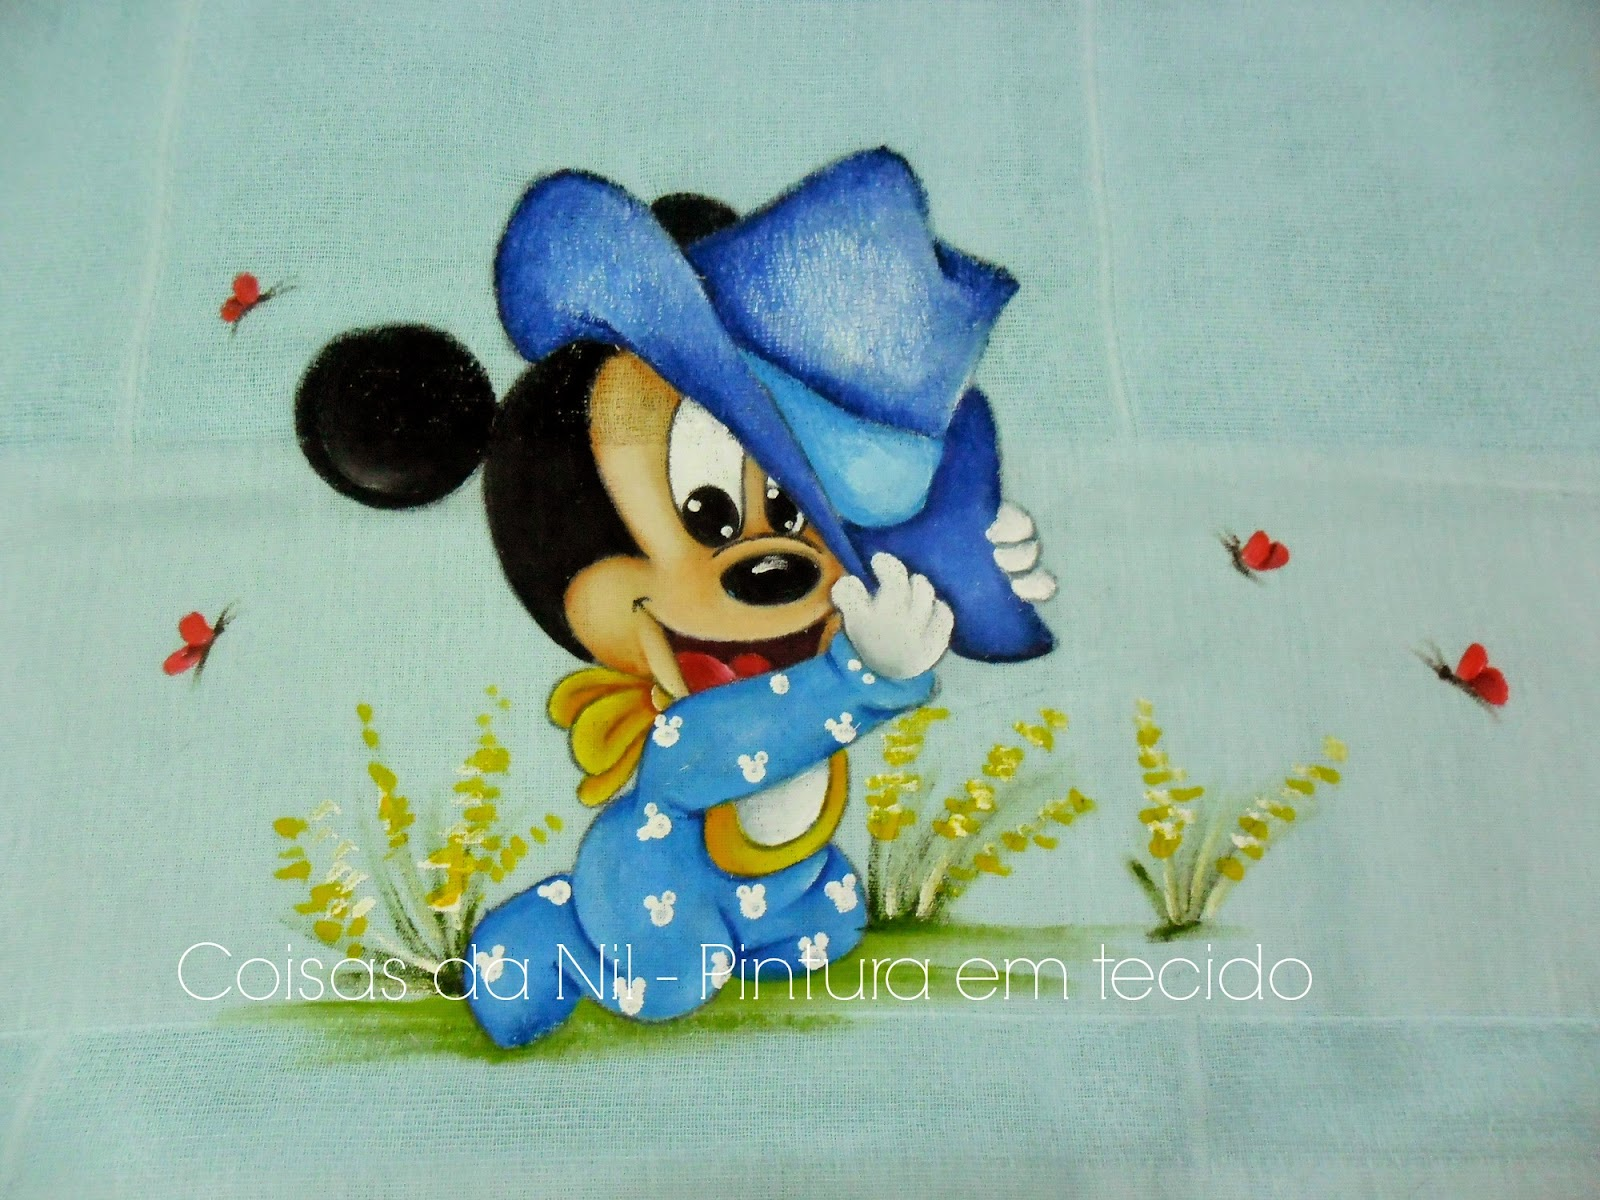 fralda pintada com mickey baby com chapeu azul